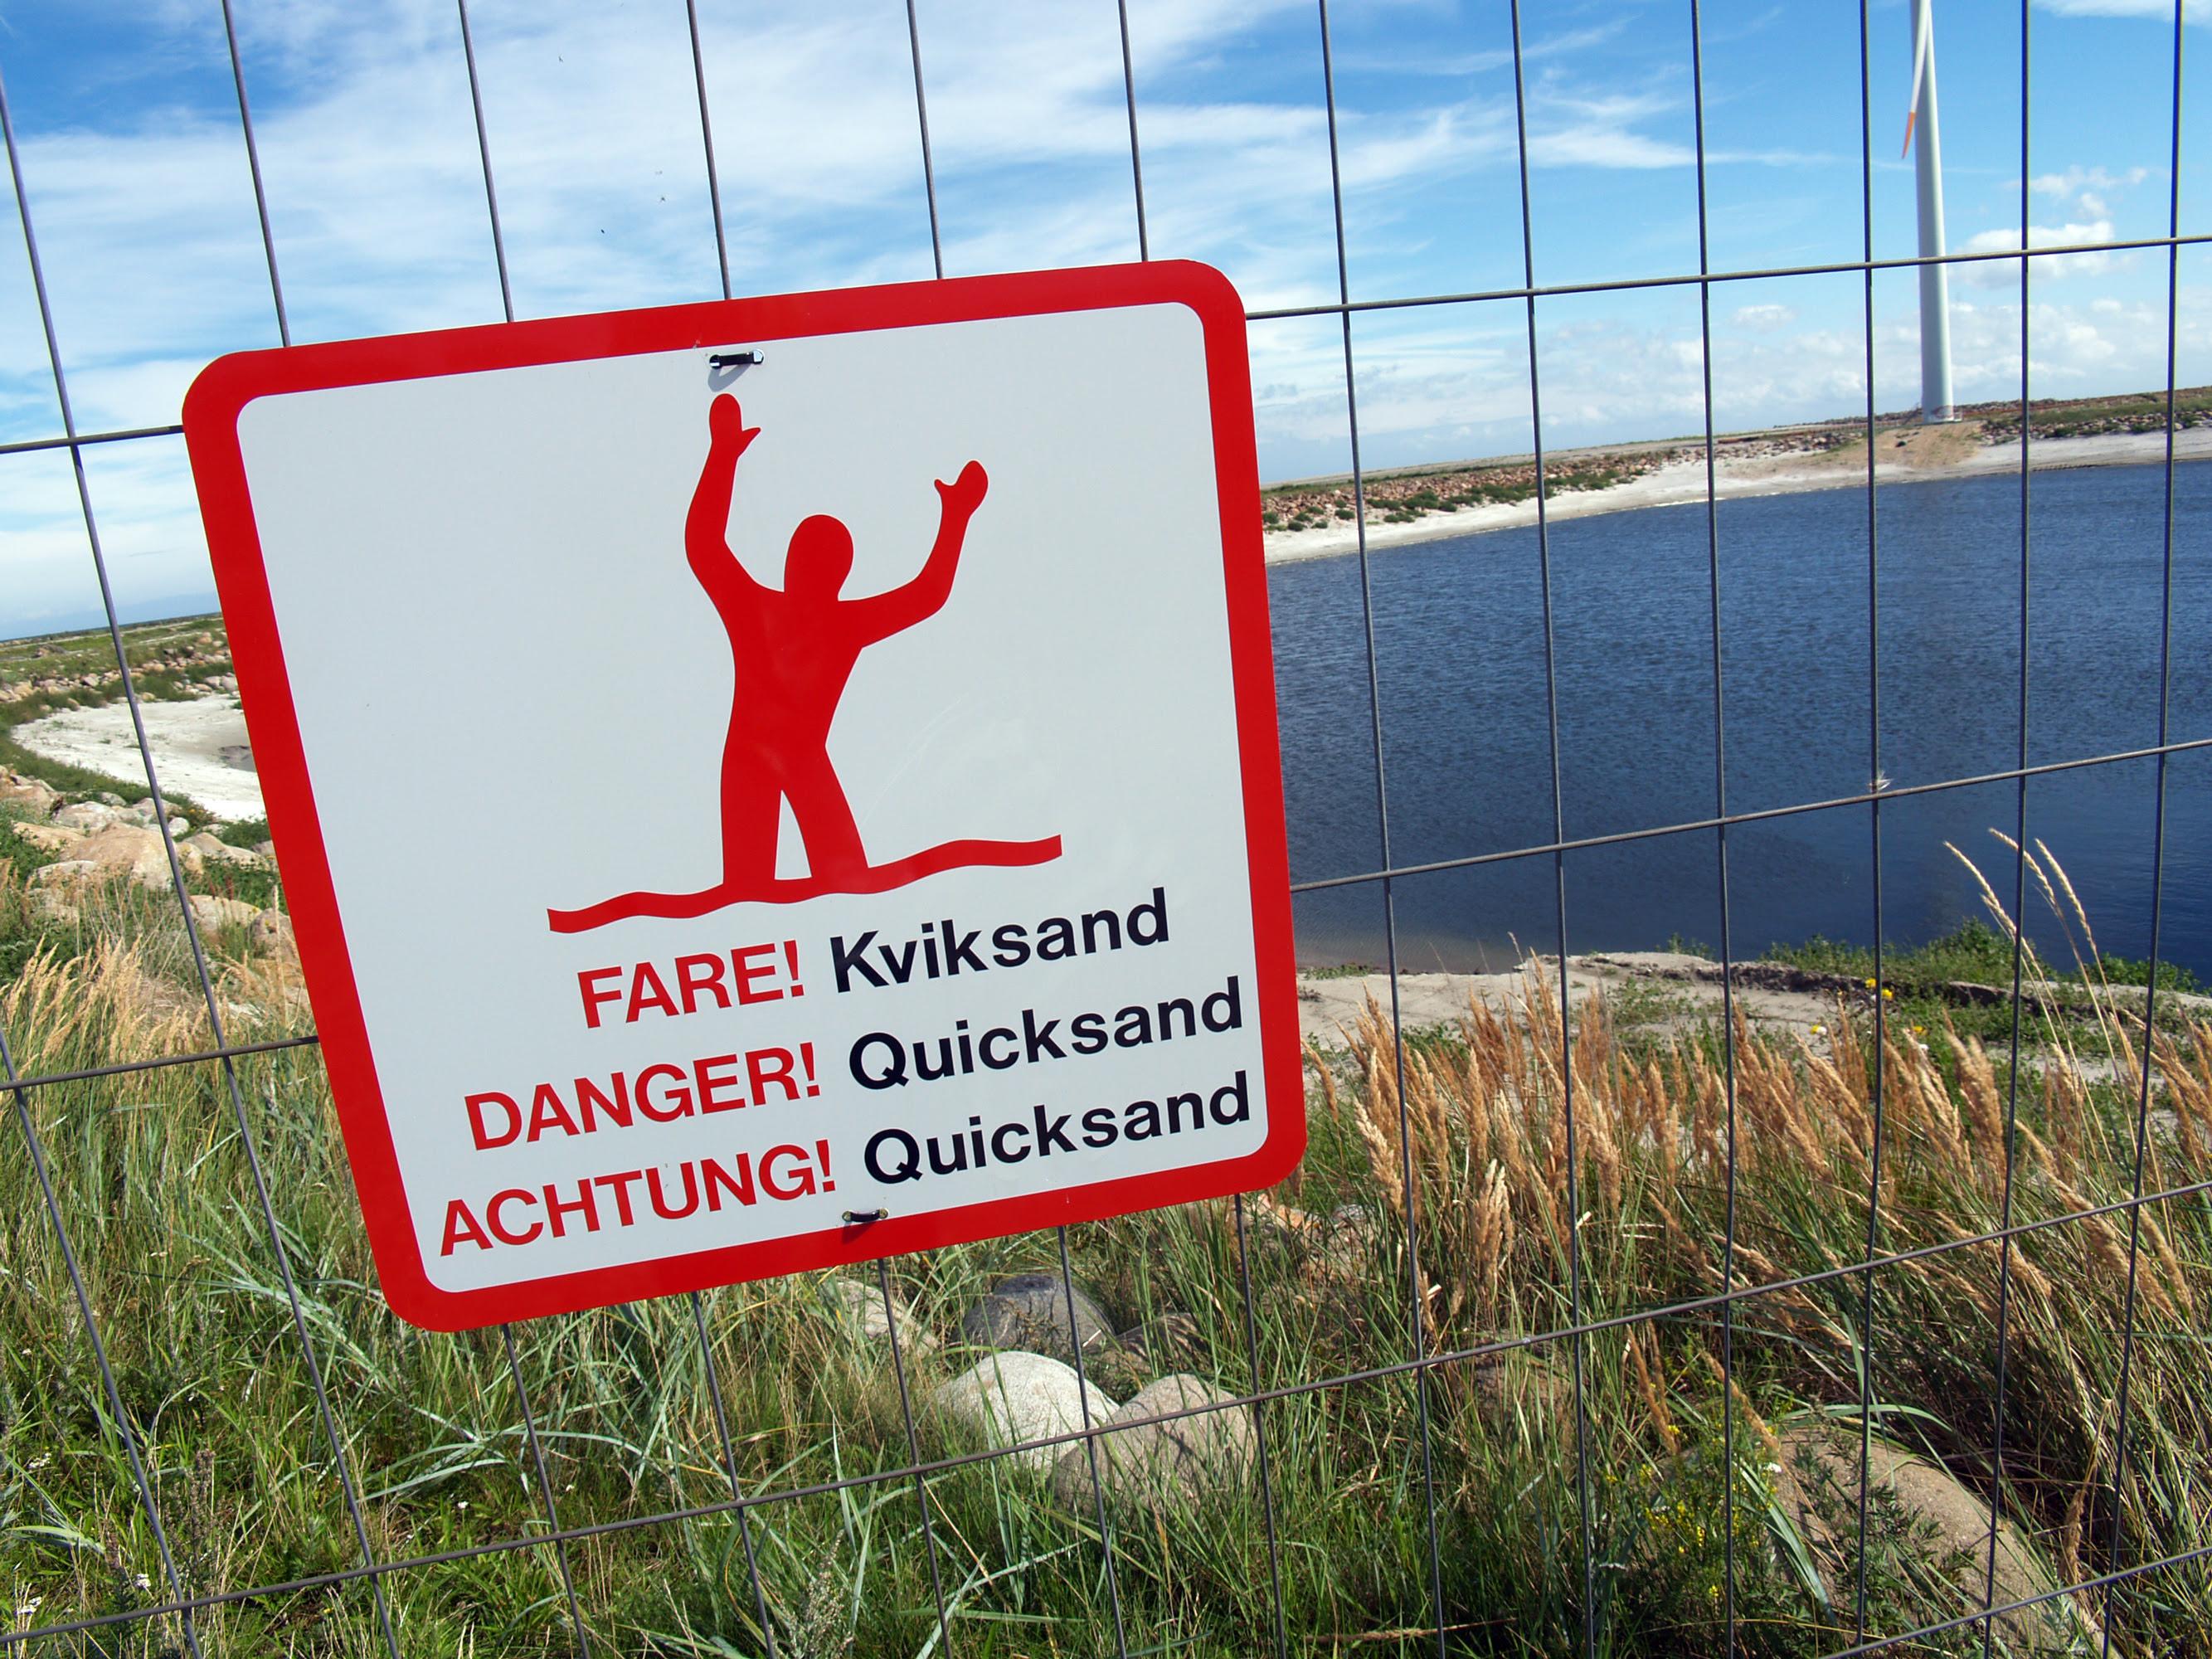 http://upload.wikimedia.org/wikipedia/commons/5/5c/Quicksand-warning-sign-denmark-2010.jpg